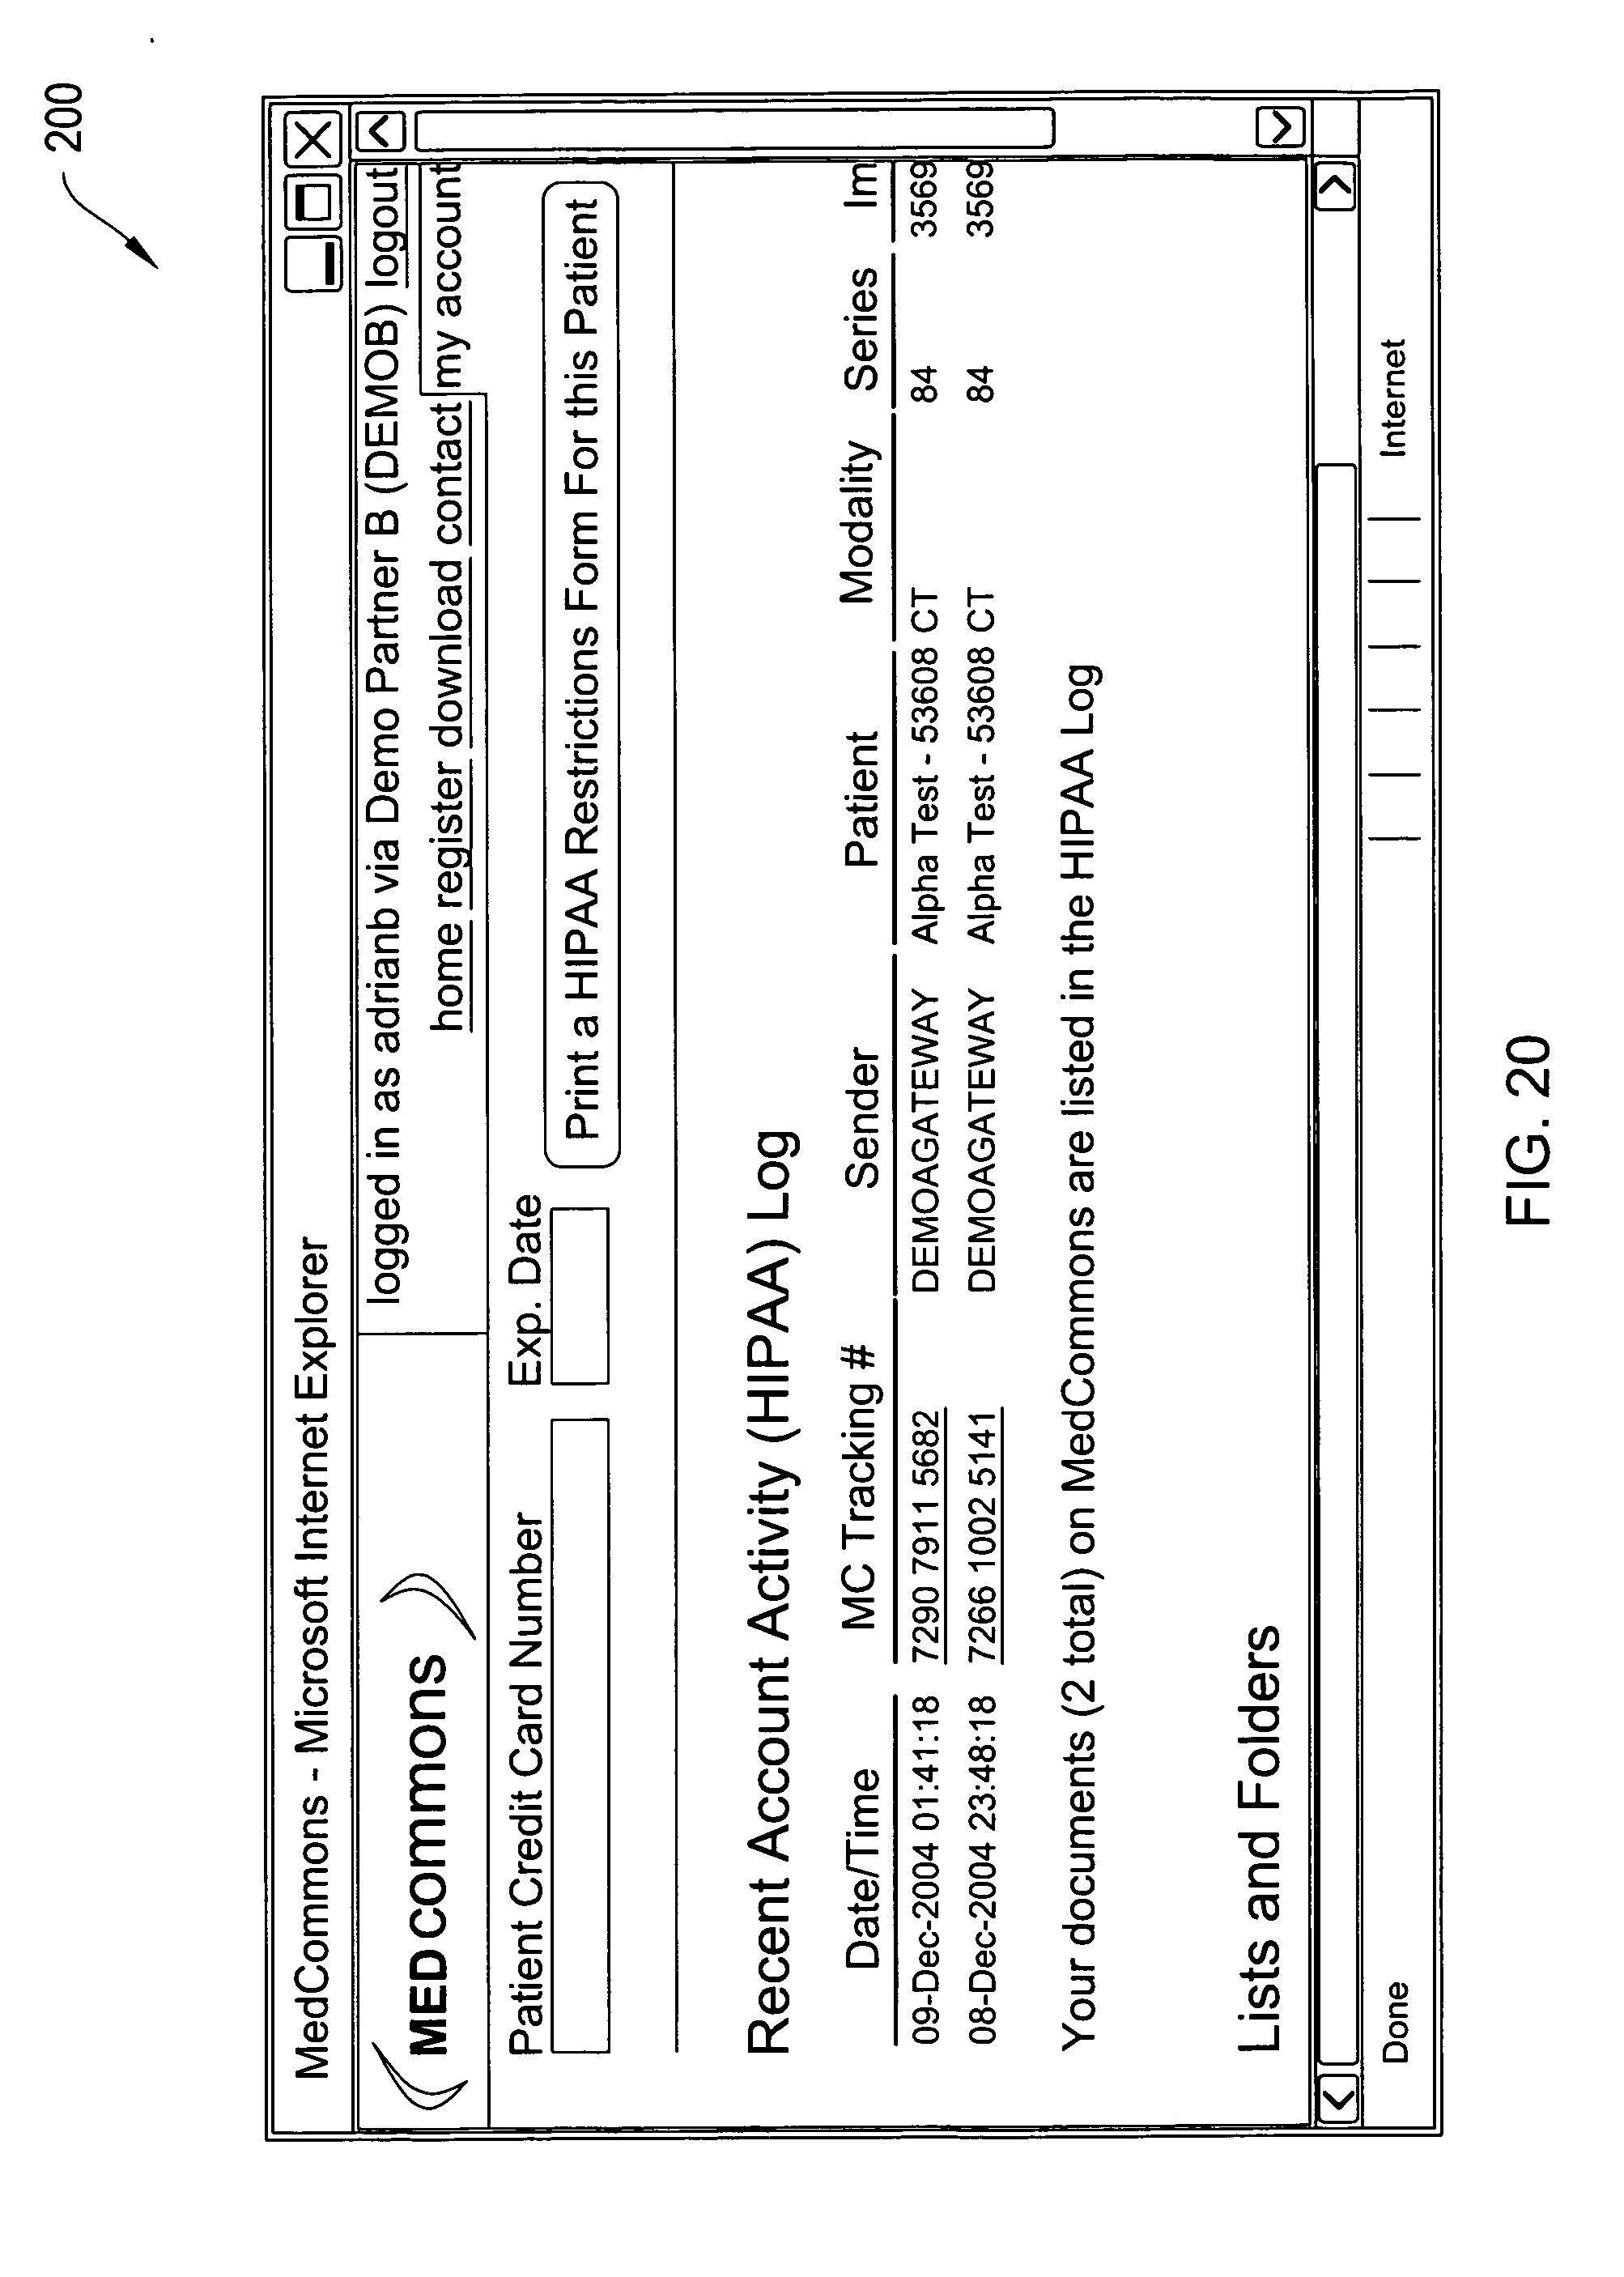 7266 portal athenahealth - Patent Drawing